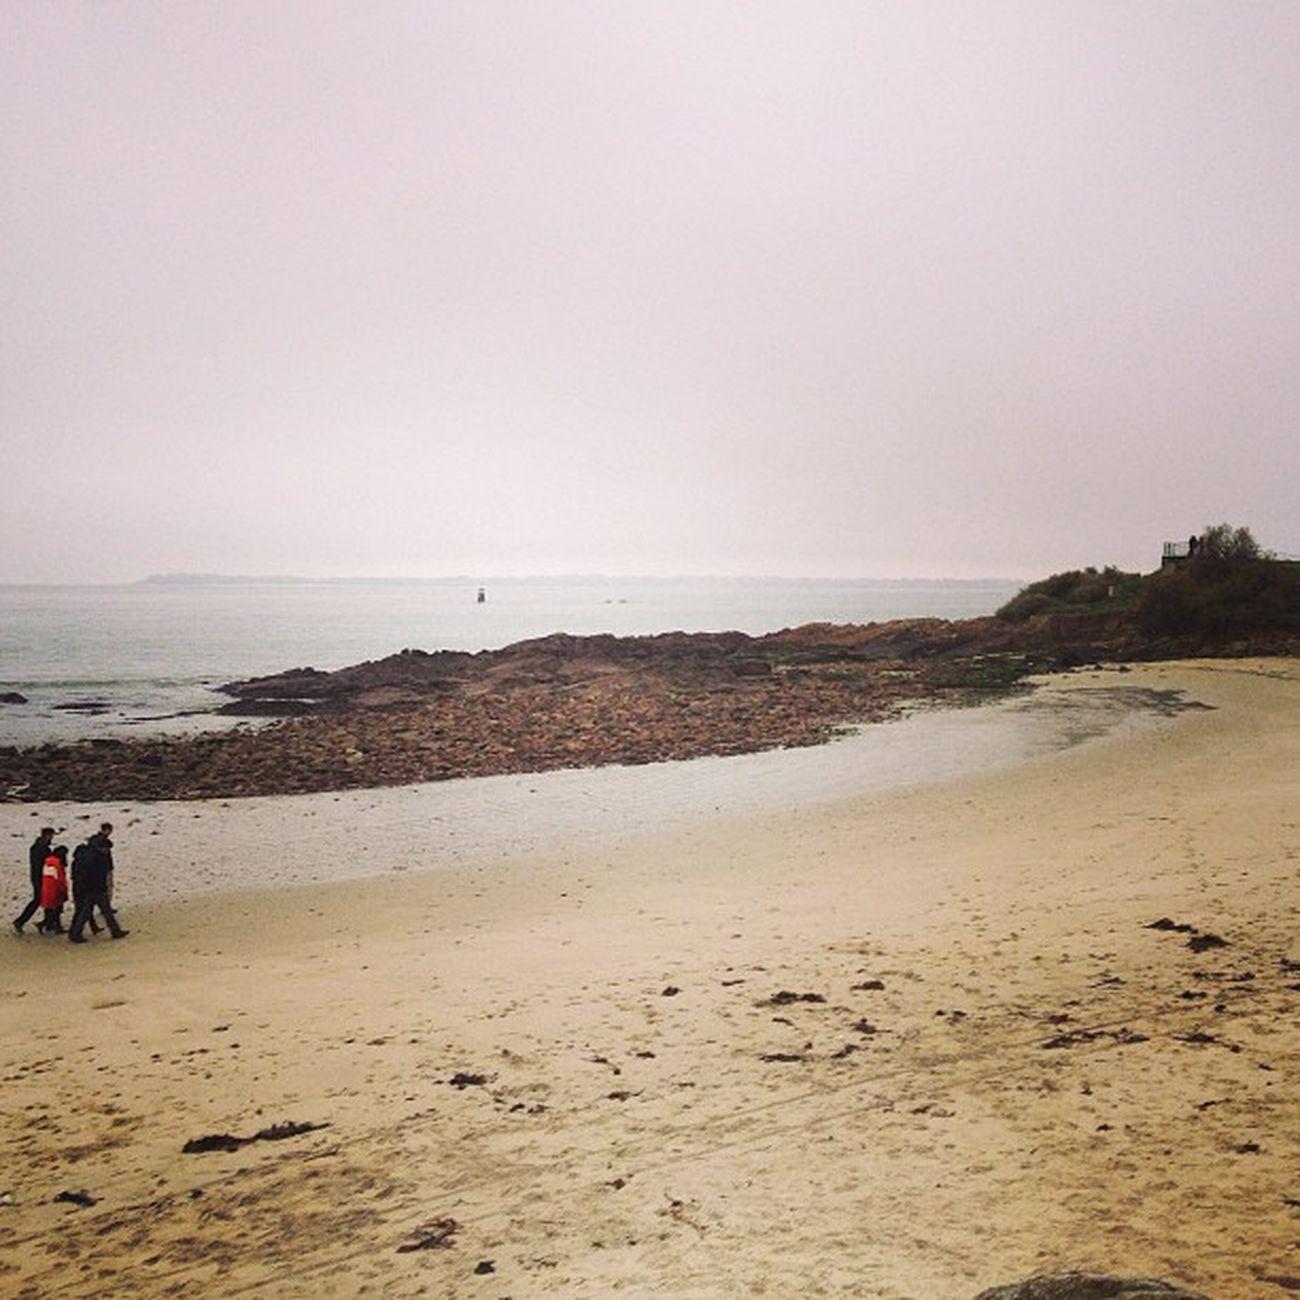 Larmor beach Beach Loriengeles Lorient Bzh bretagne breizh instamood mood picoftheday photooftheday labricotier larmorbeach larmorplage